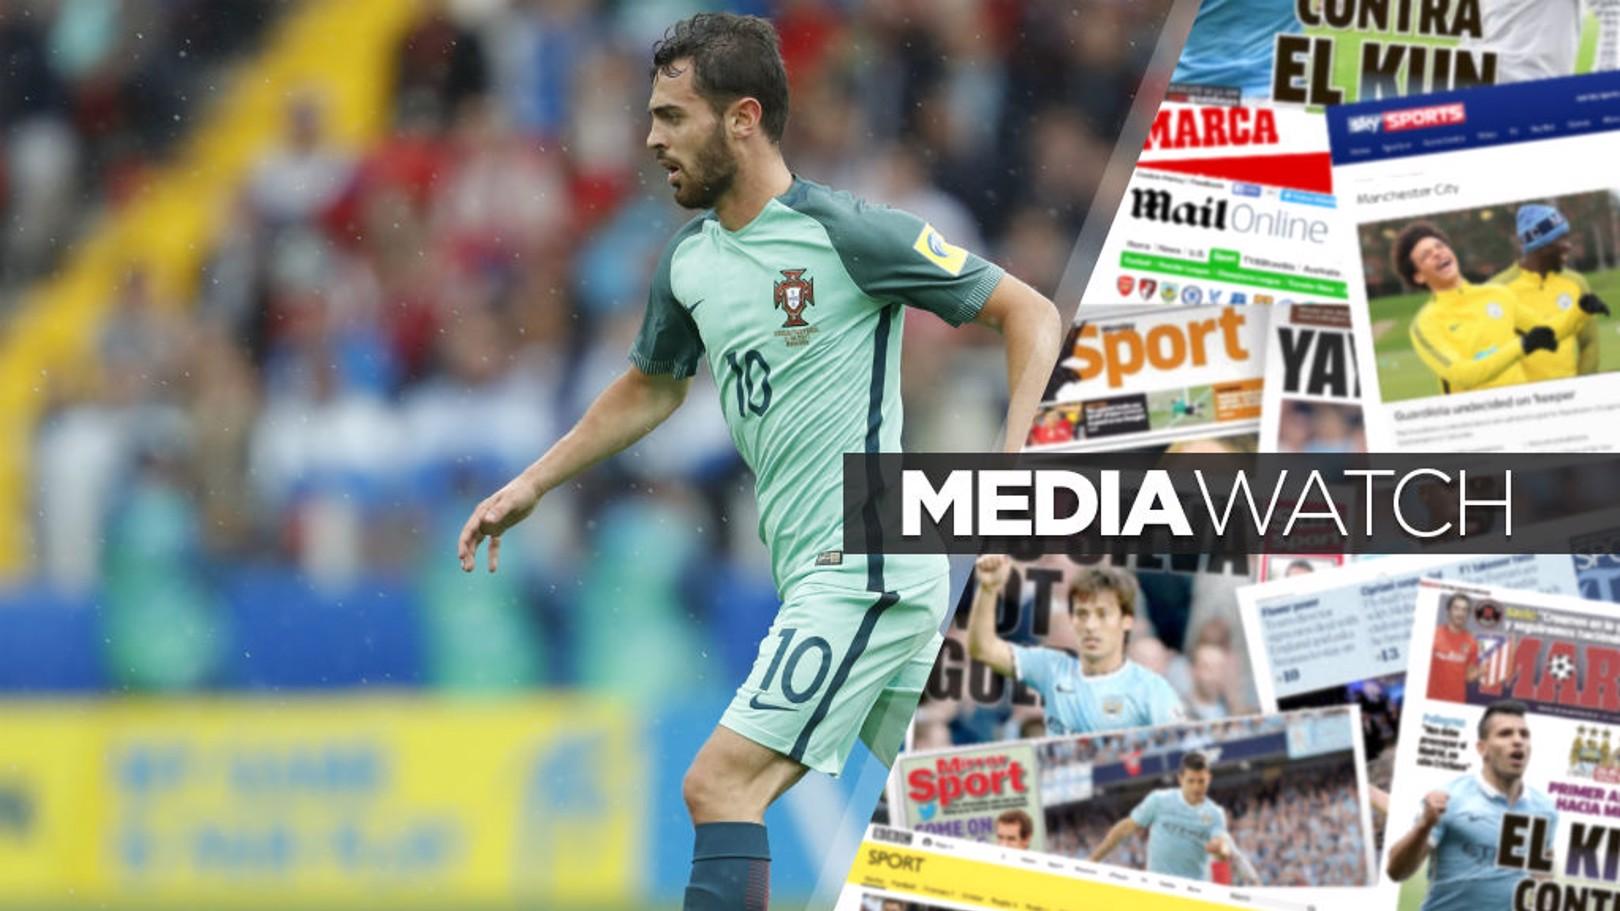 SILVA SERVICE: Bernardo has eased fears over his Confederations Cup injury scare